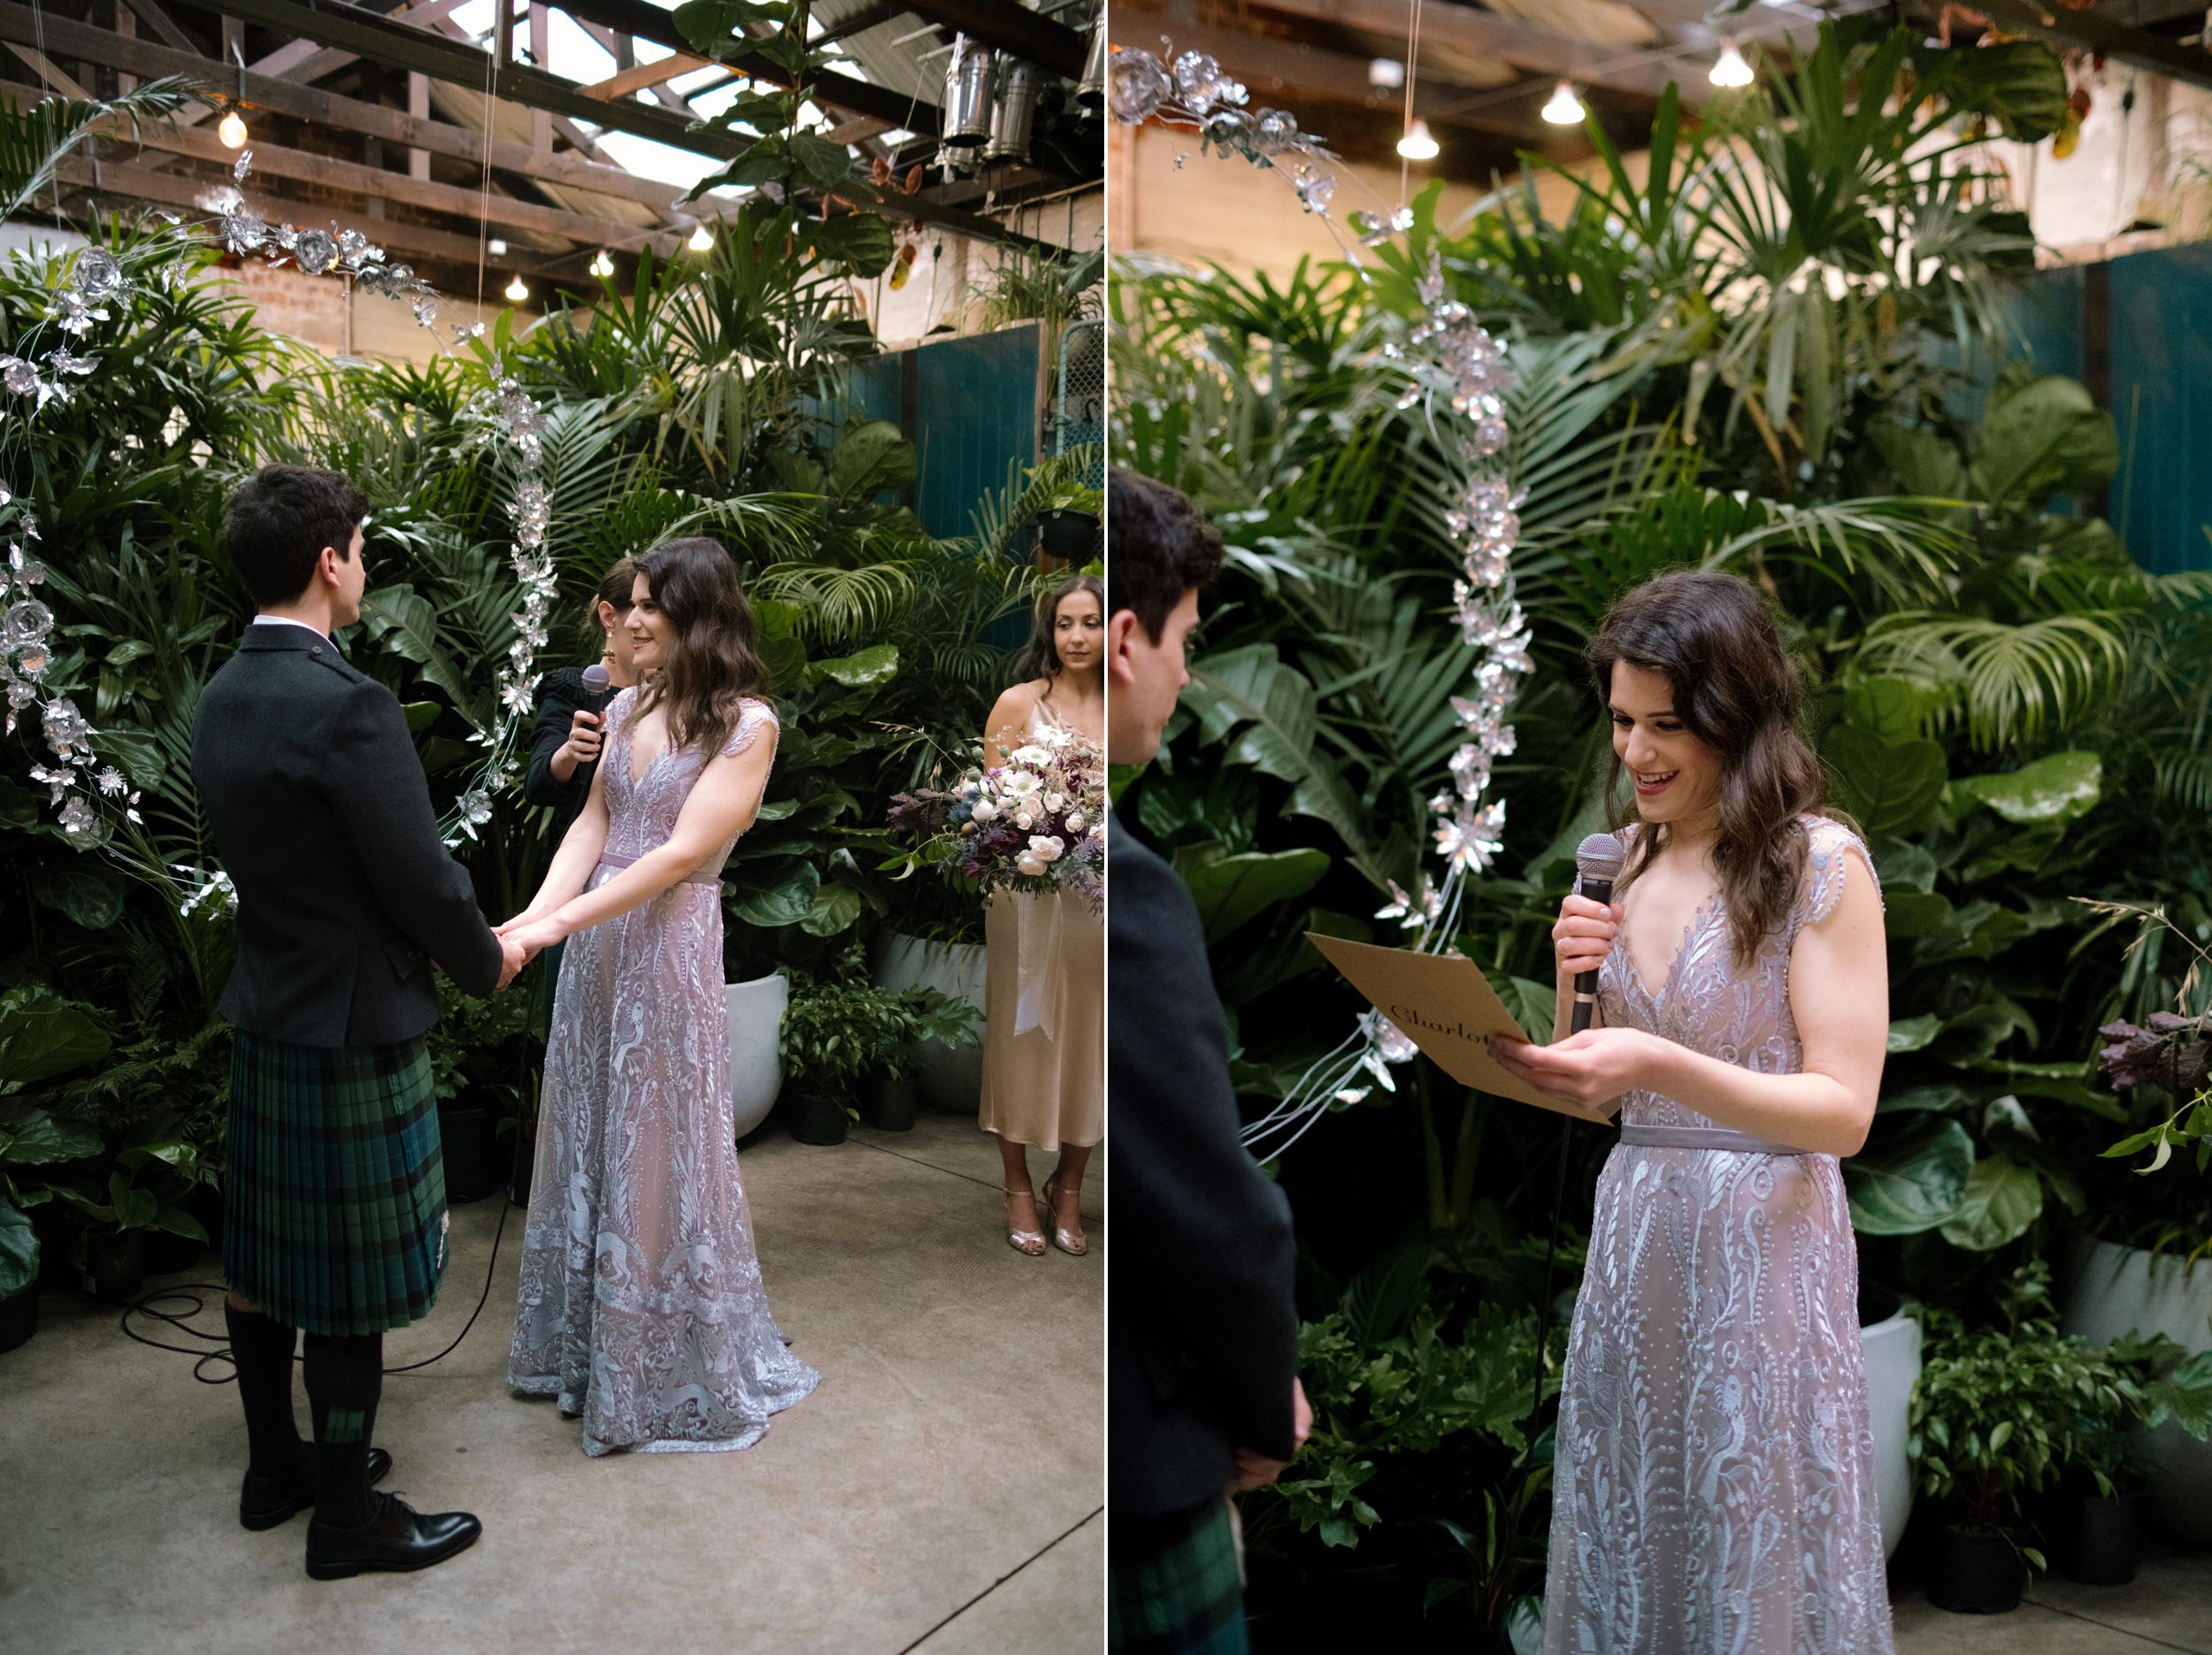 I-Got-You-Babe-&.Co.-Glasshaus-Wedding-Charlotte-Cameron0071.JPG